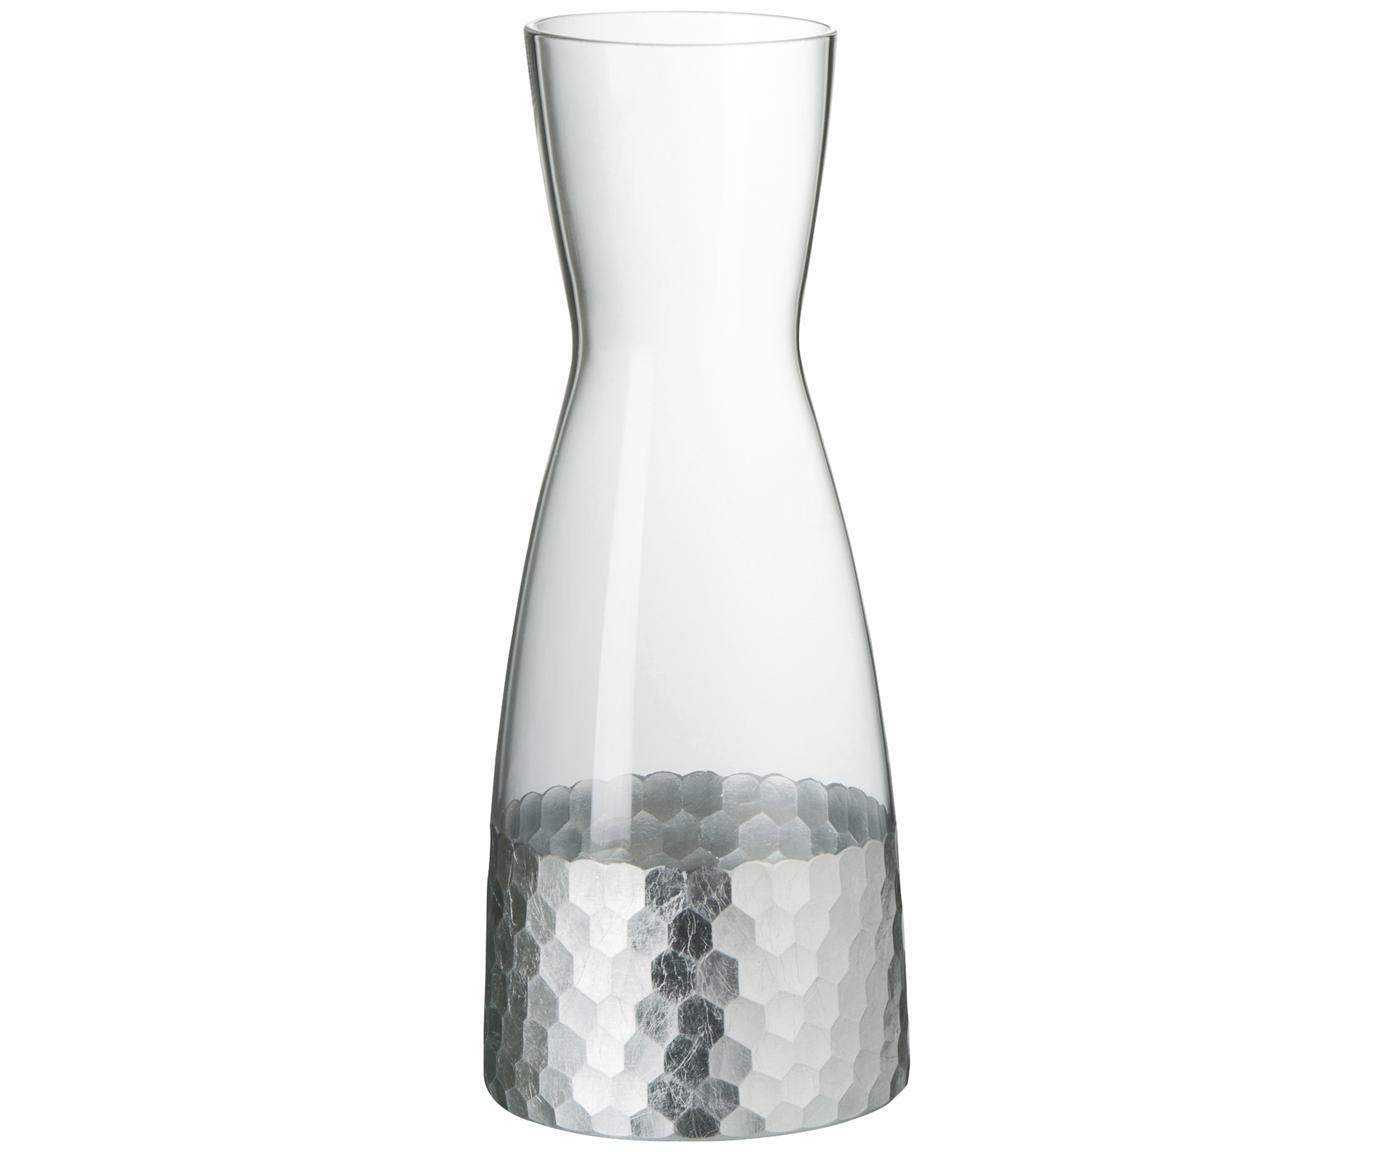 Karaf Wasp, Glas, Transparant, zilvergrijskleurig, 1.15 L